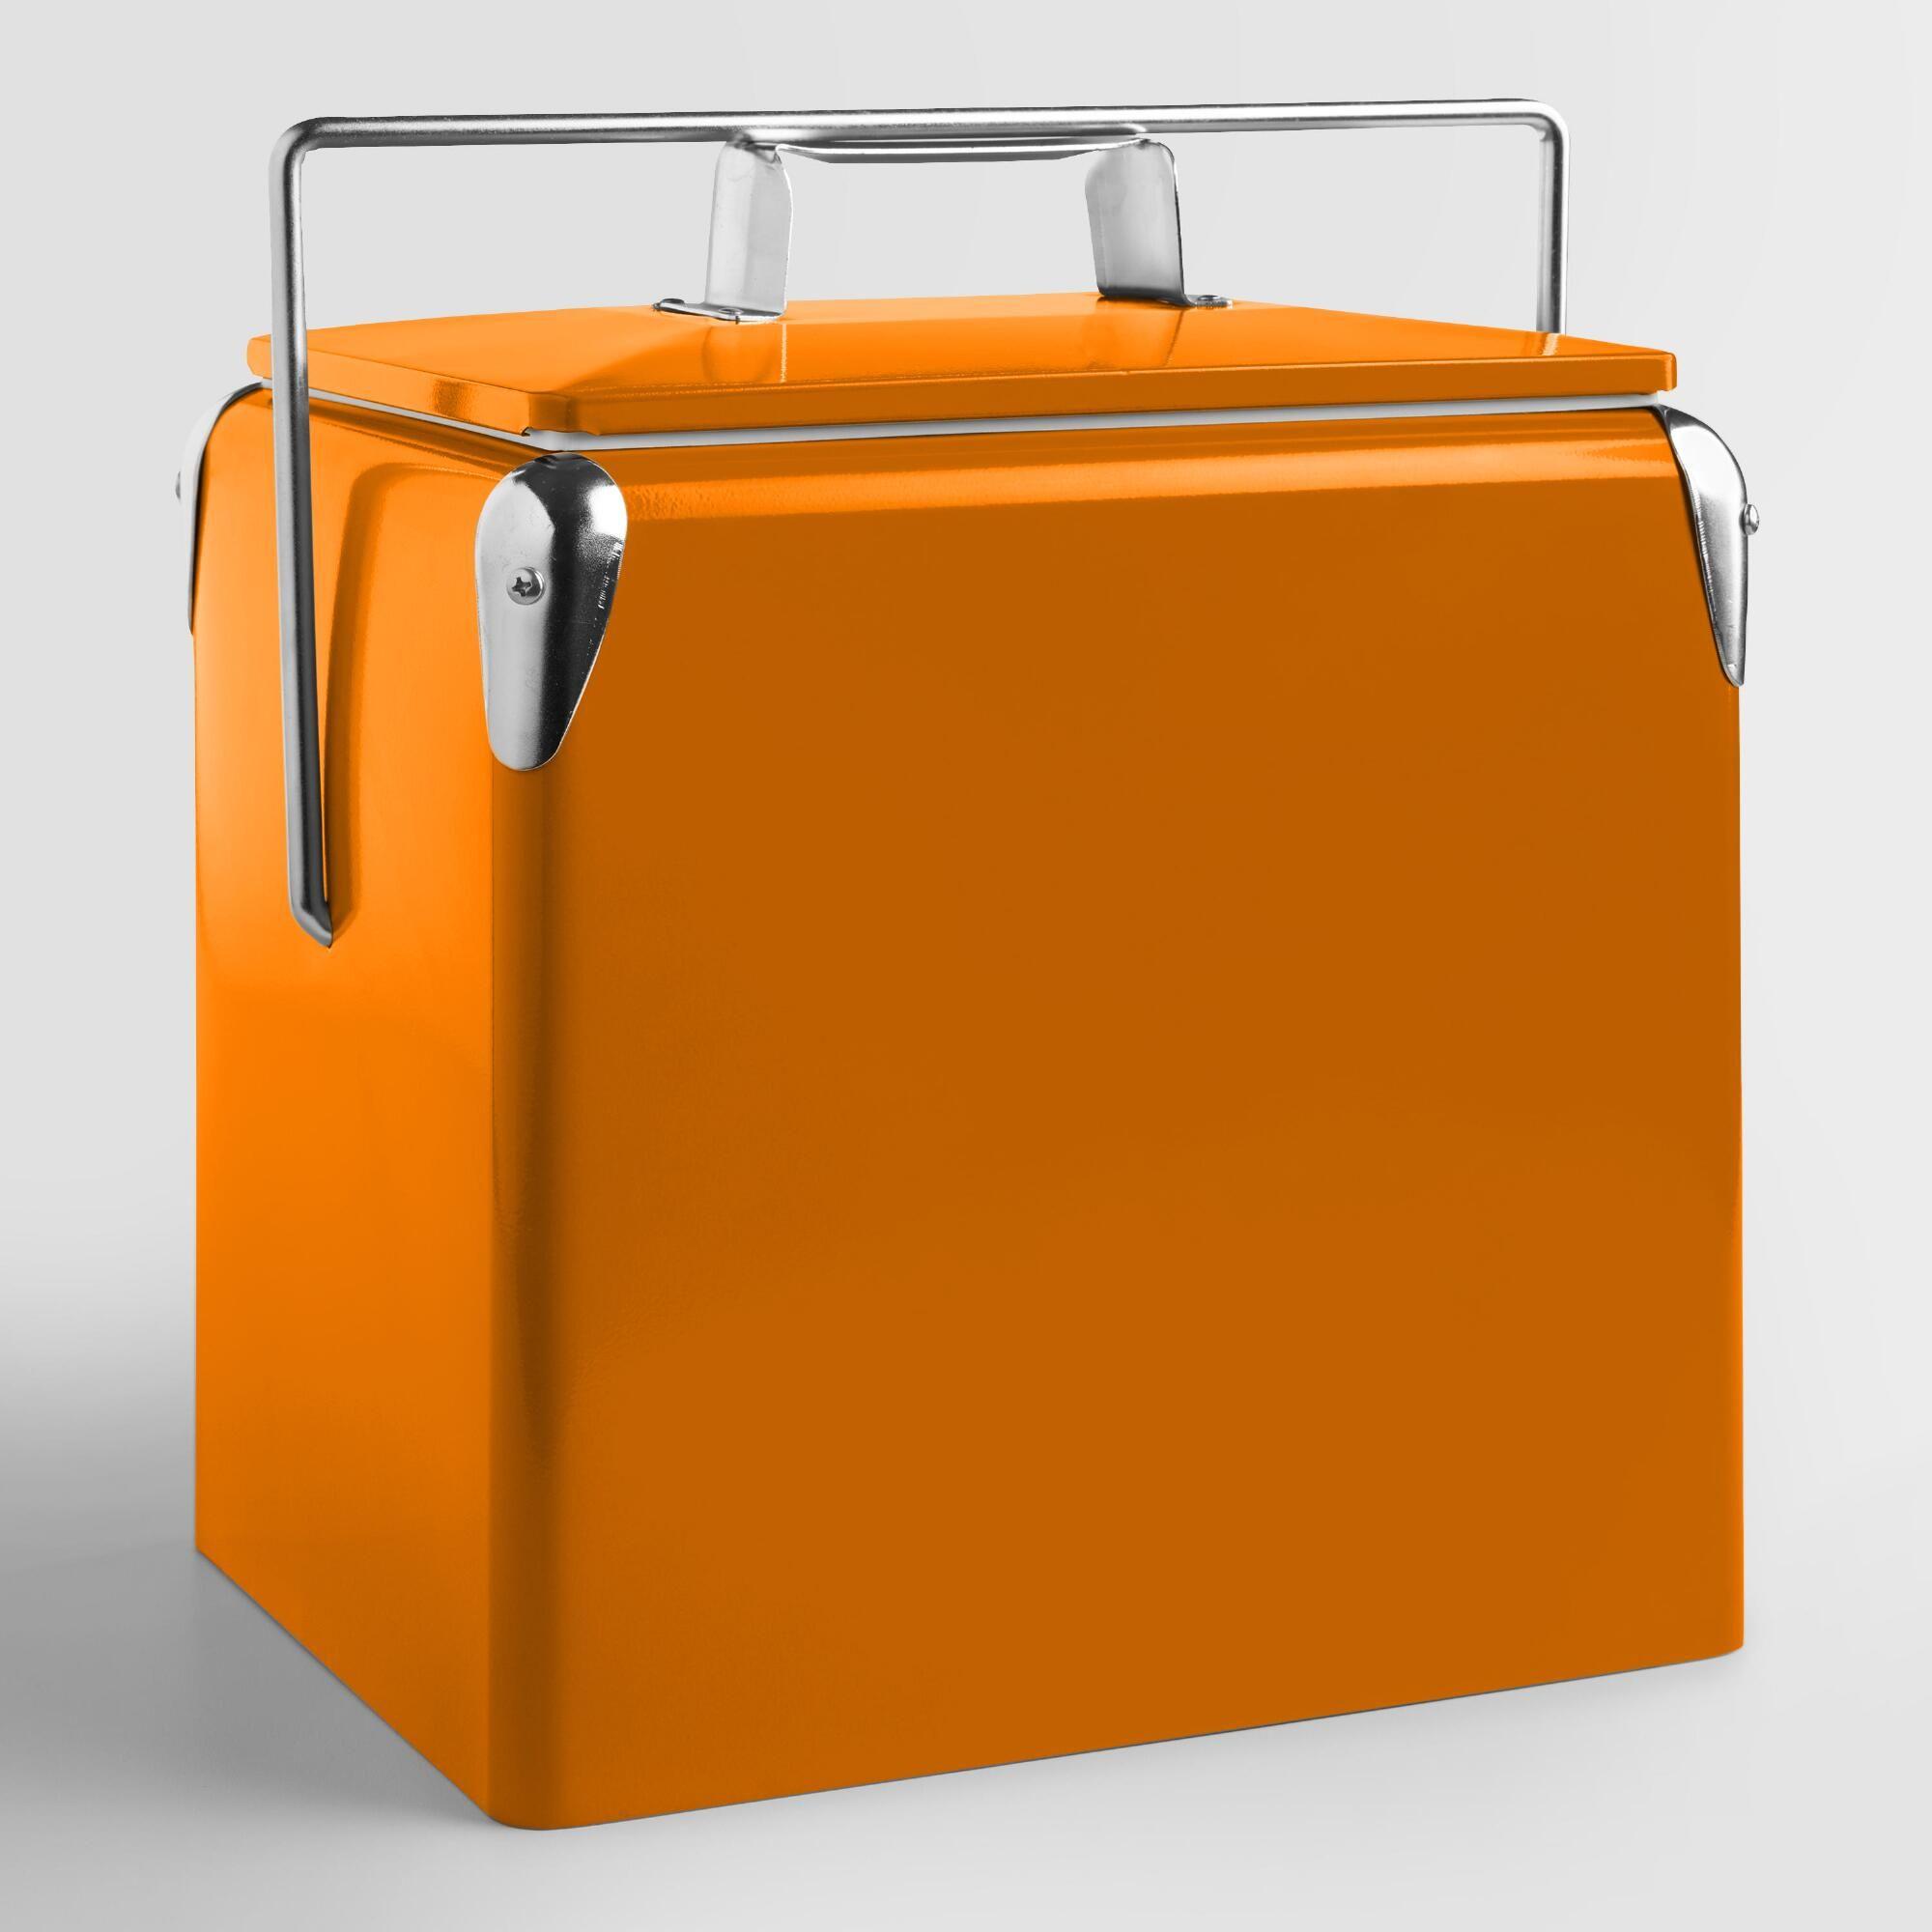 Orange Retro Drink Cooler Retro cooler, Beverage cooler